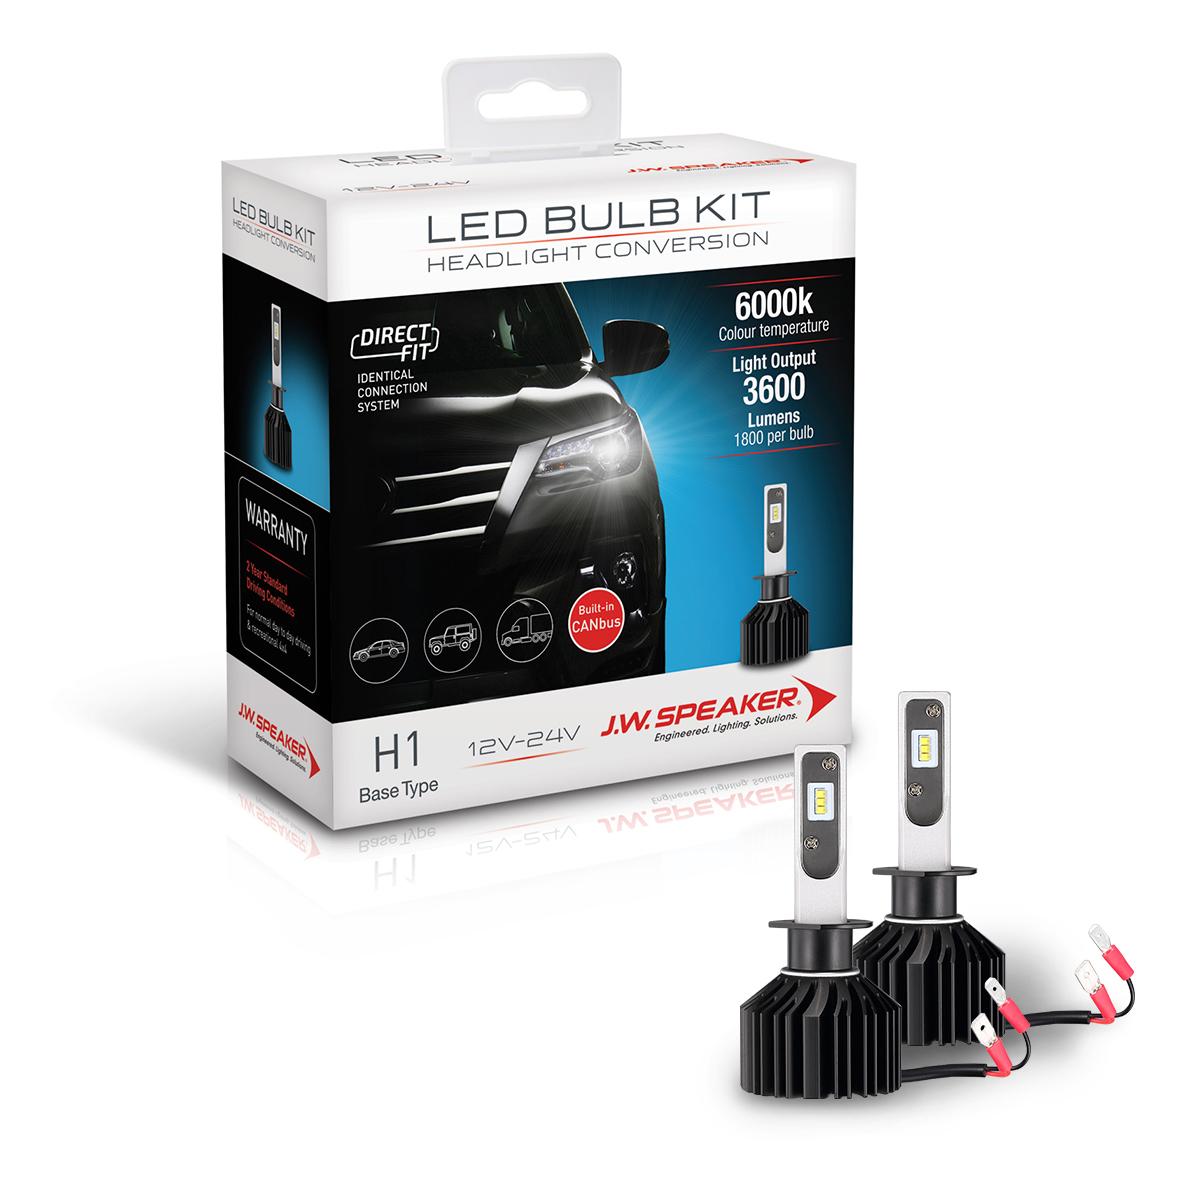 Led Headlight Conversion Kit  U2013 Direct Fit  U2013 Invision Sales